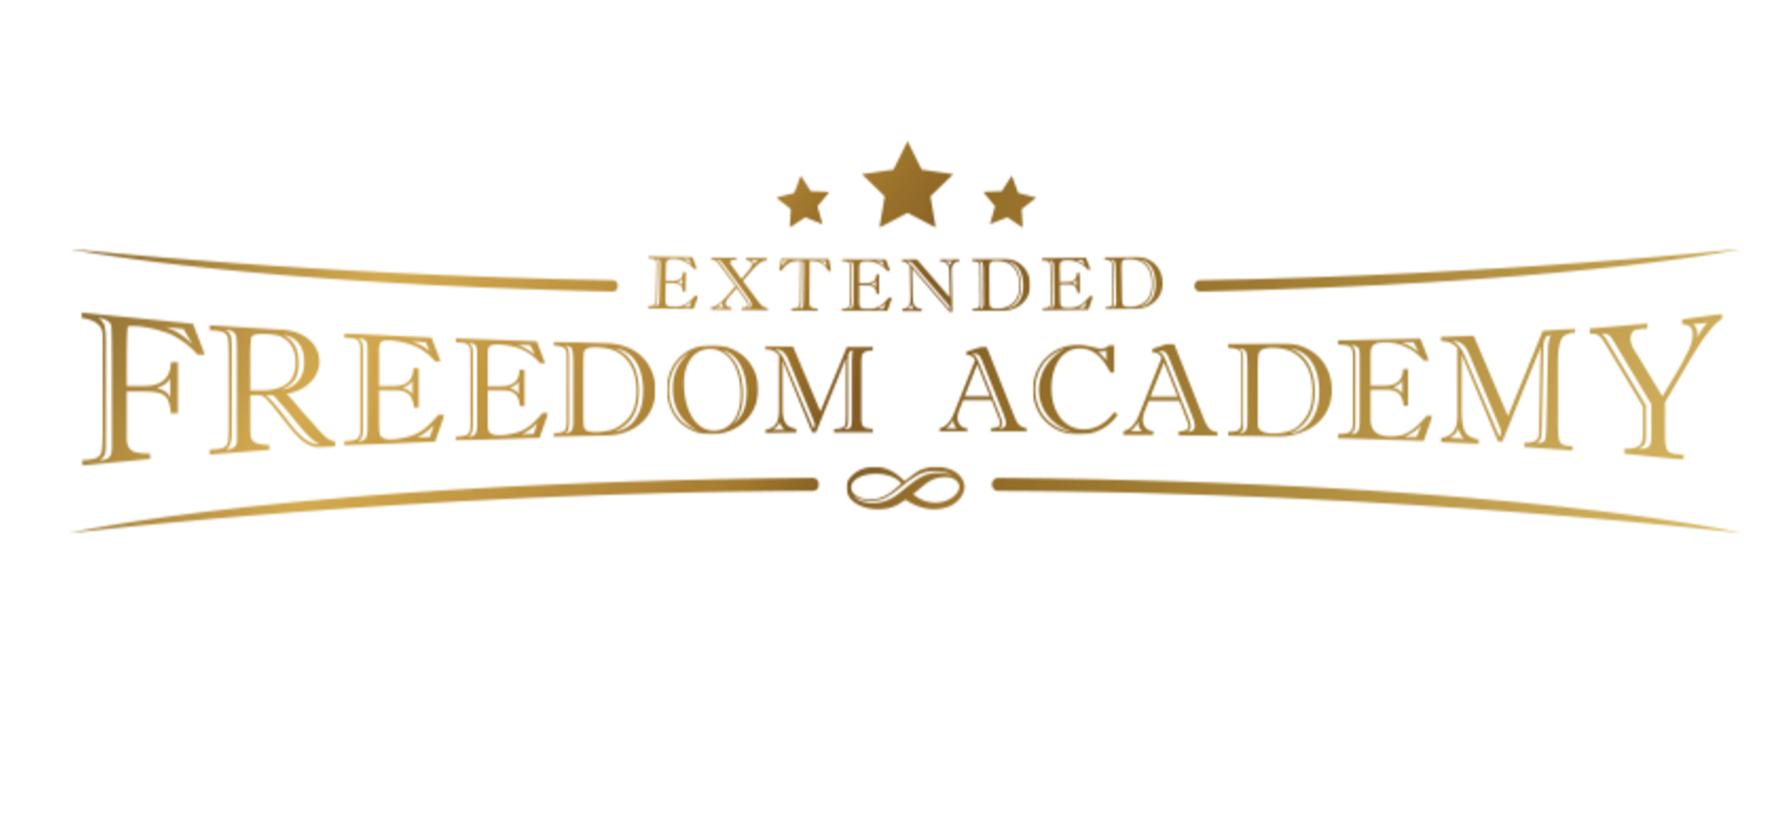 Extended Freedom Academy hemsida